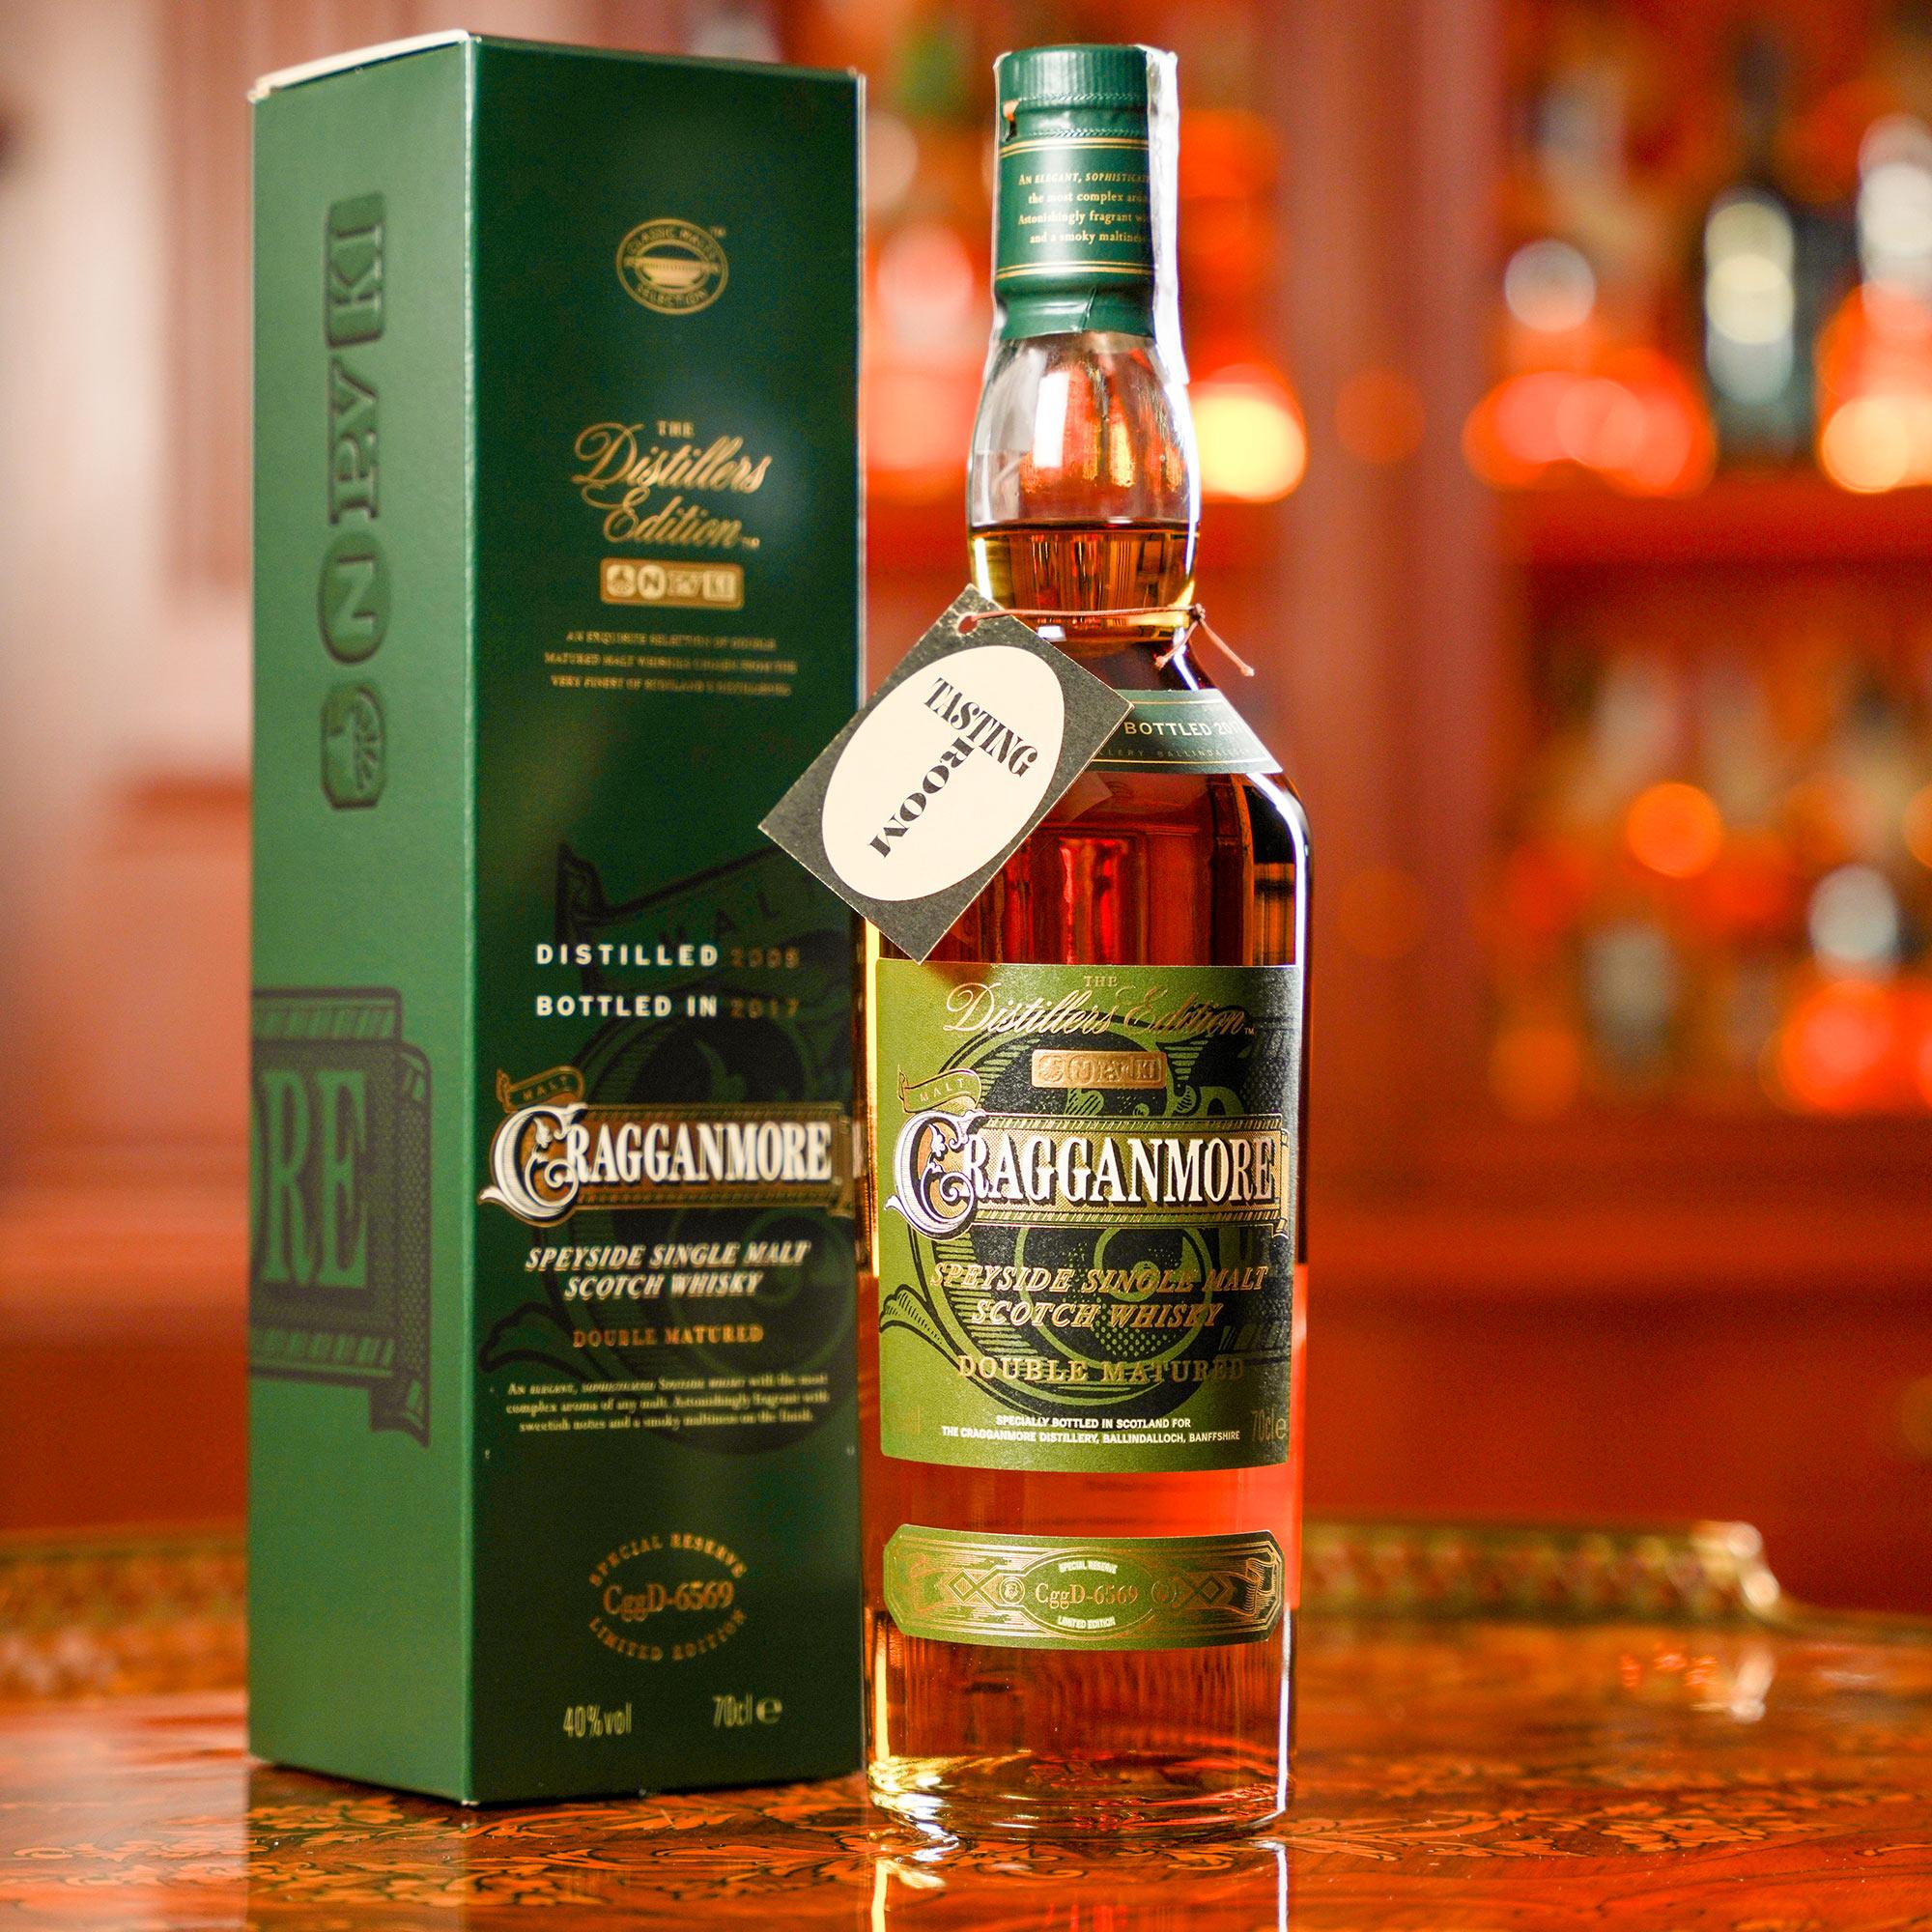 Cragganmore Distillers Edition 2017 /Краганмор Дестилърс Едишън 2017